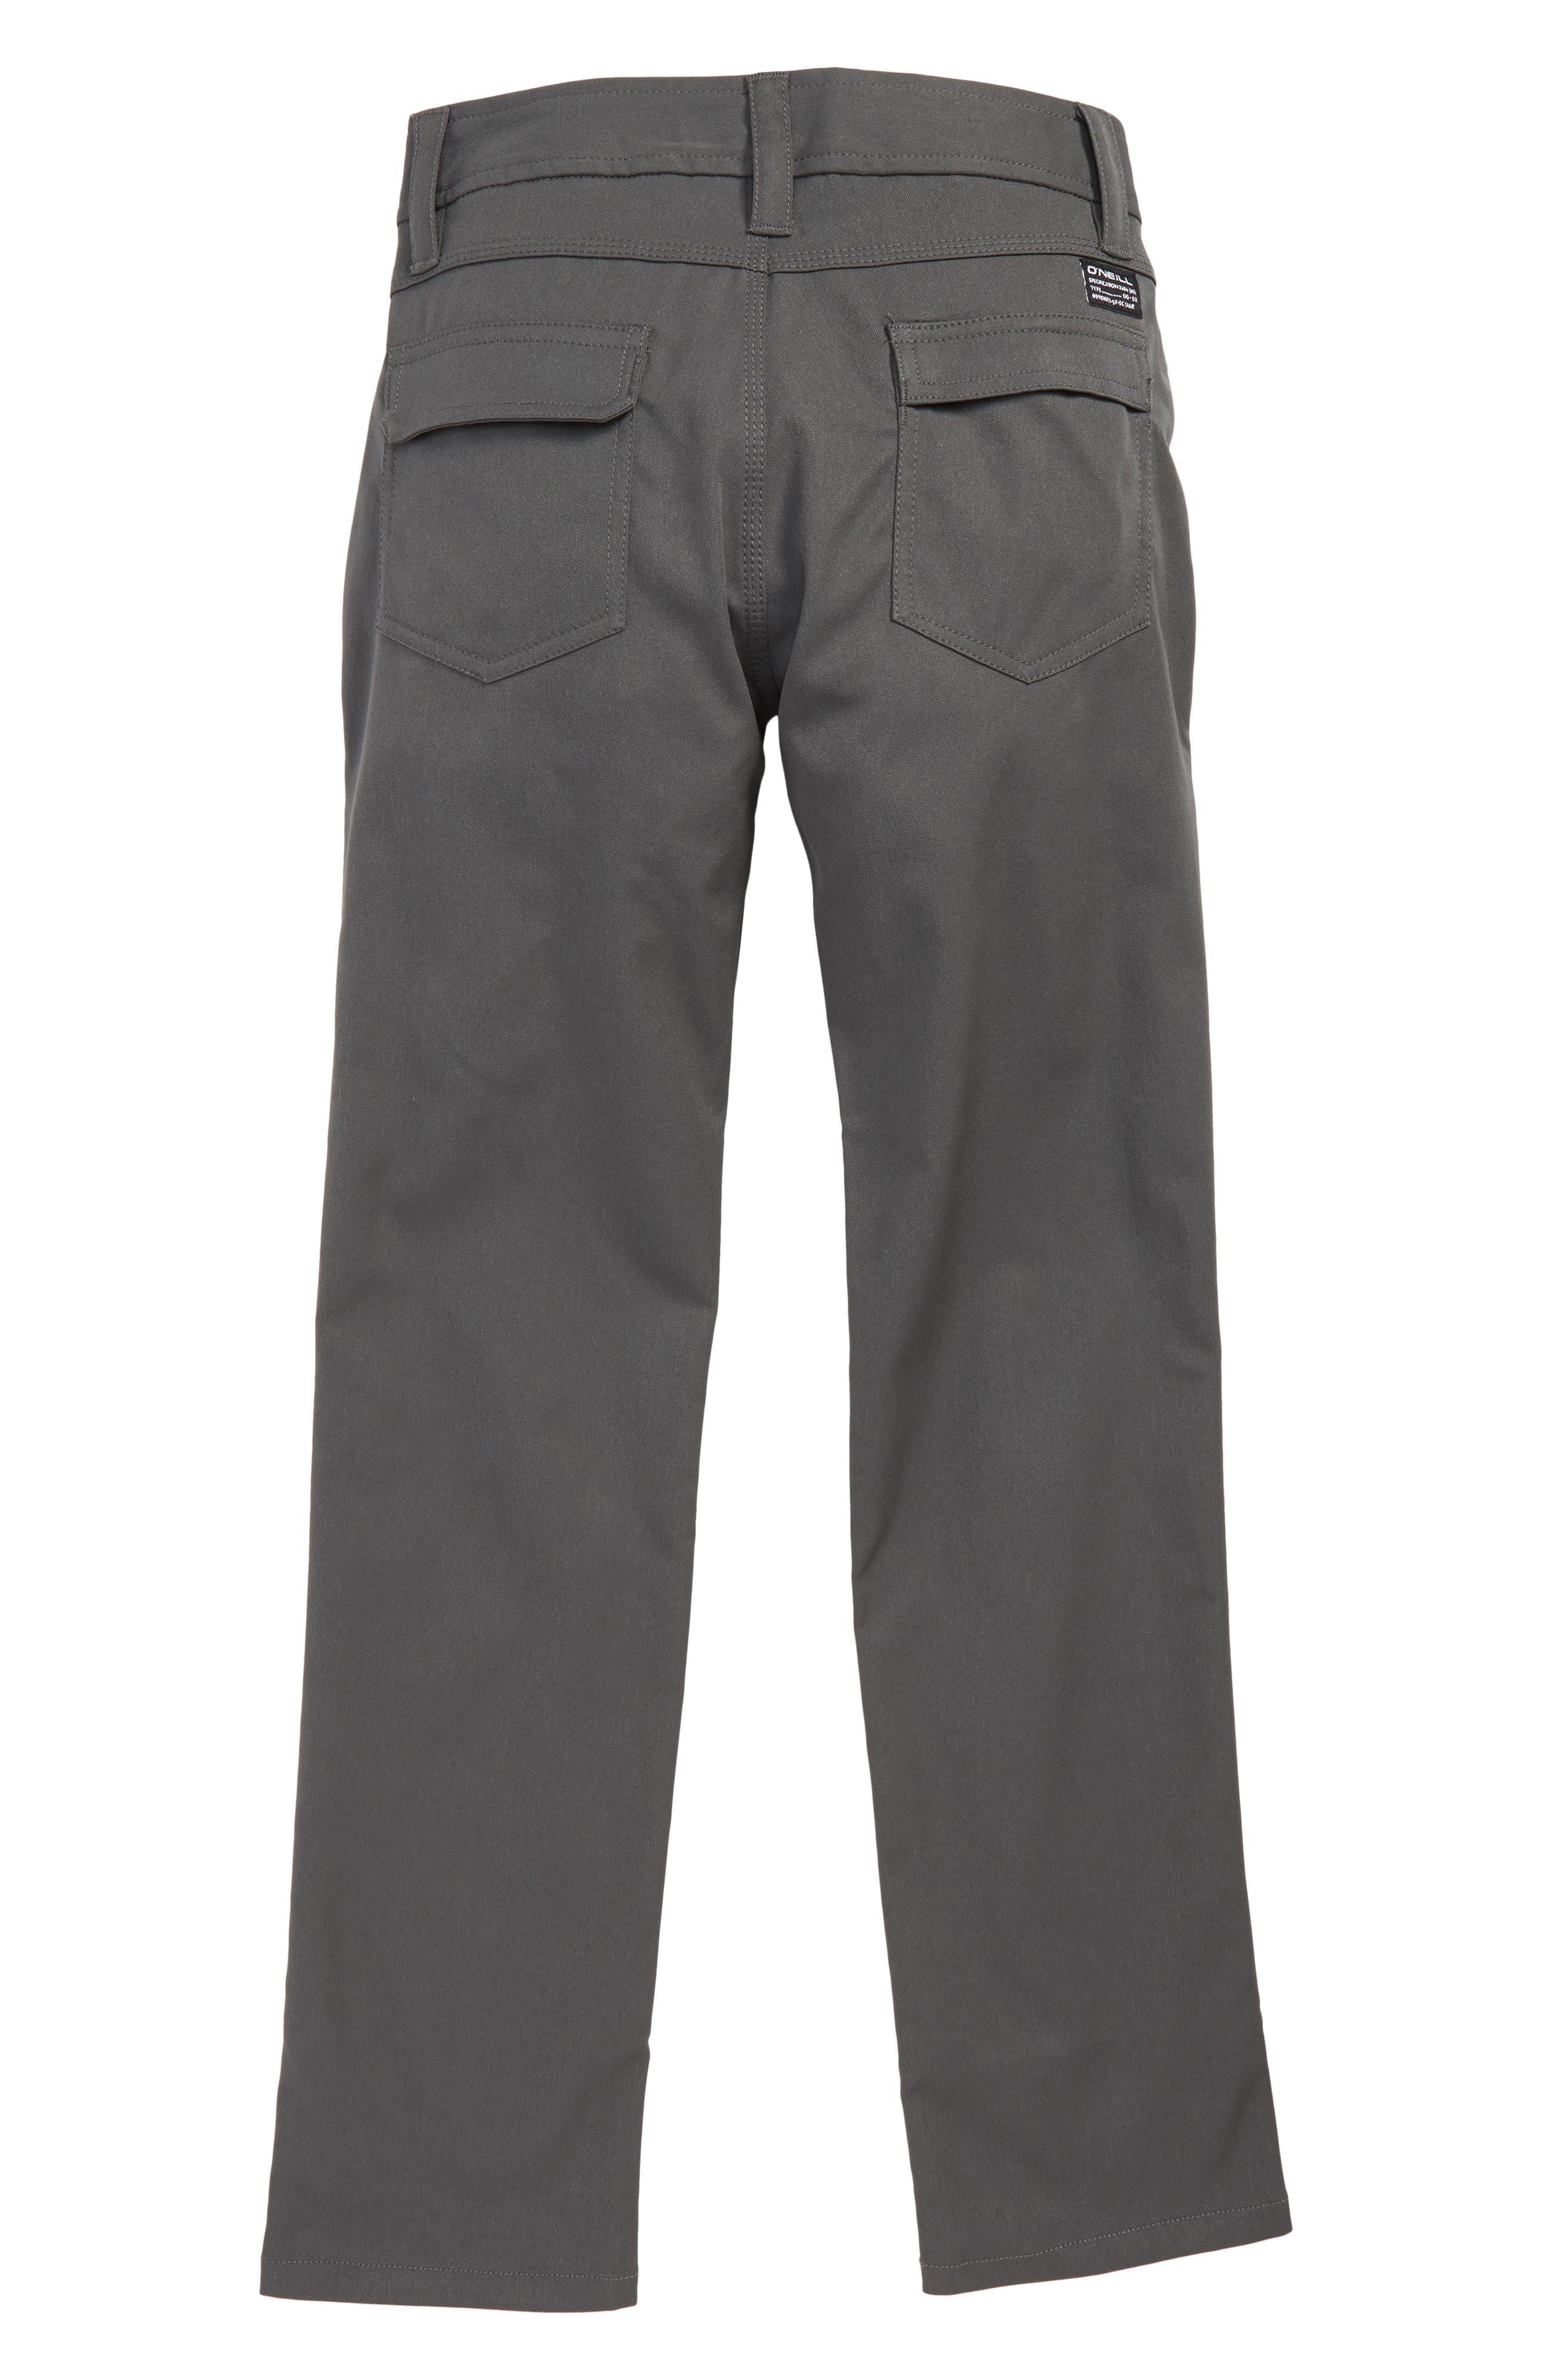 Redlands Hybrid Pants,                             Alternate thumbnail 2, color,                             Dark Fatigue